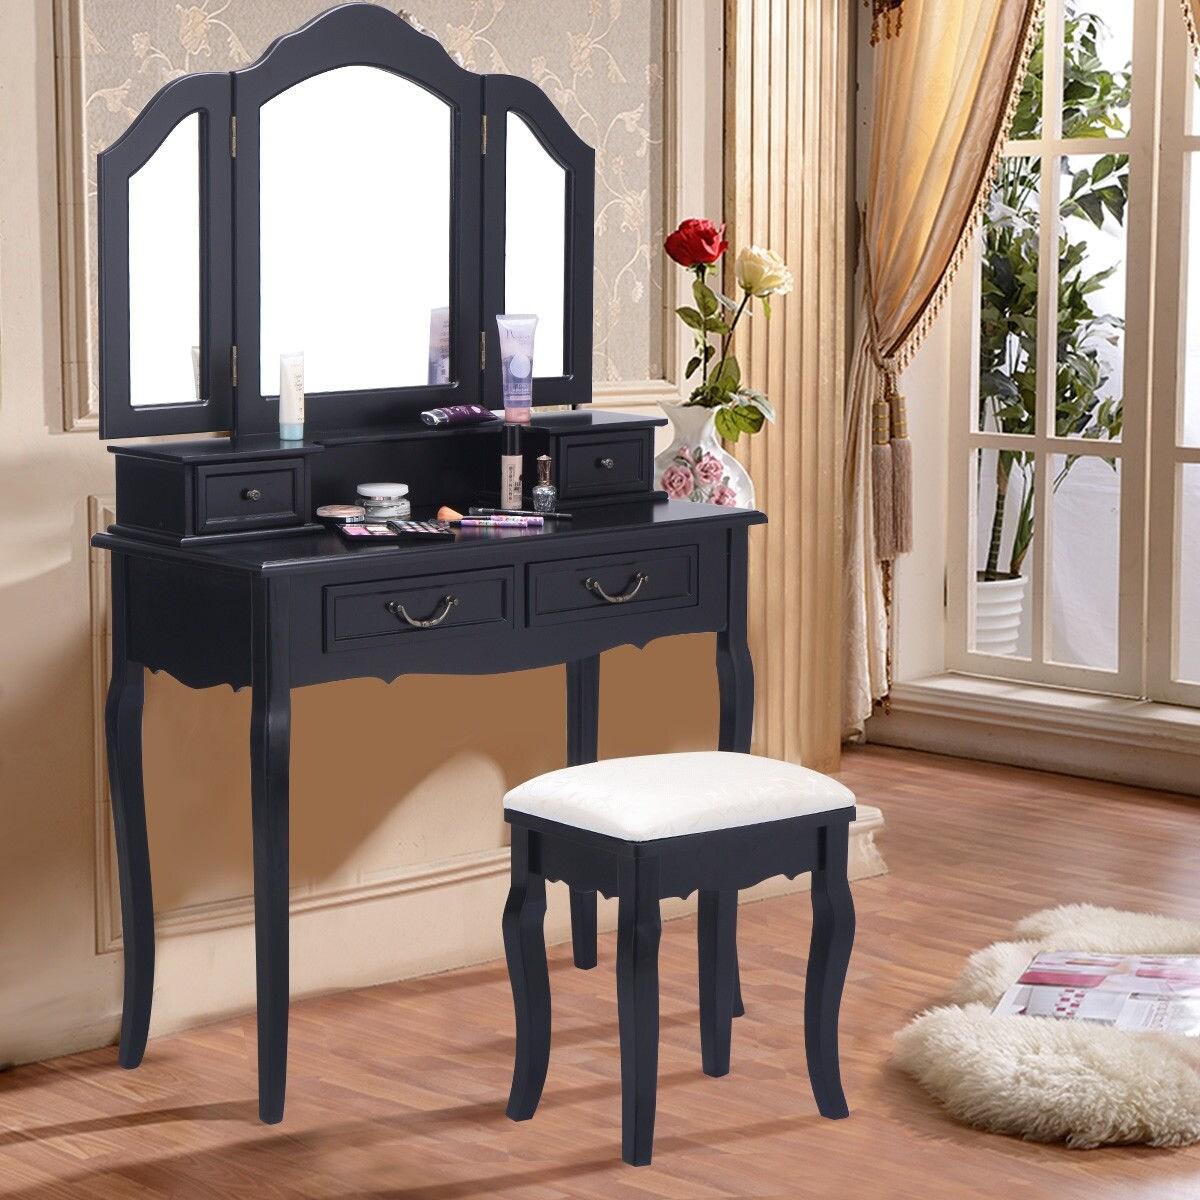 Shop Costway Tri Folding Mirror Bathroom Wood Vanity Set Makeup